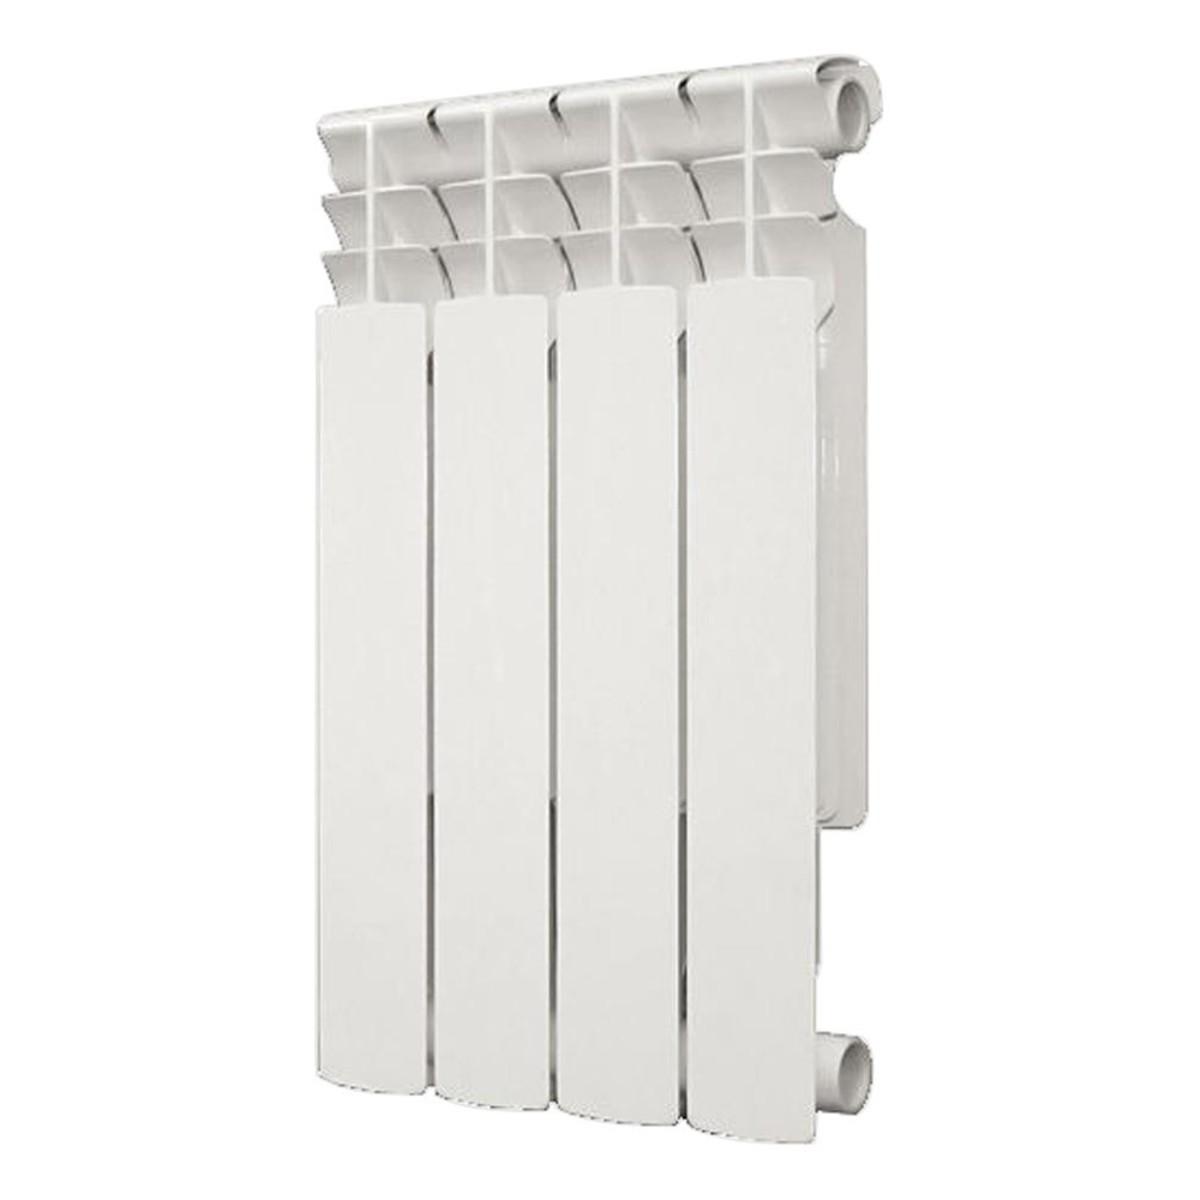 Радиатор BimettaDel&#39 Terra 29971 4 секции